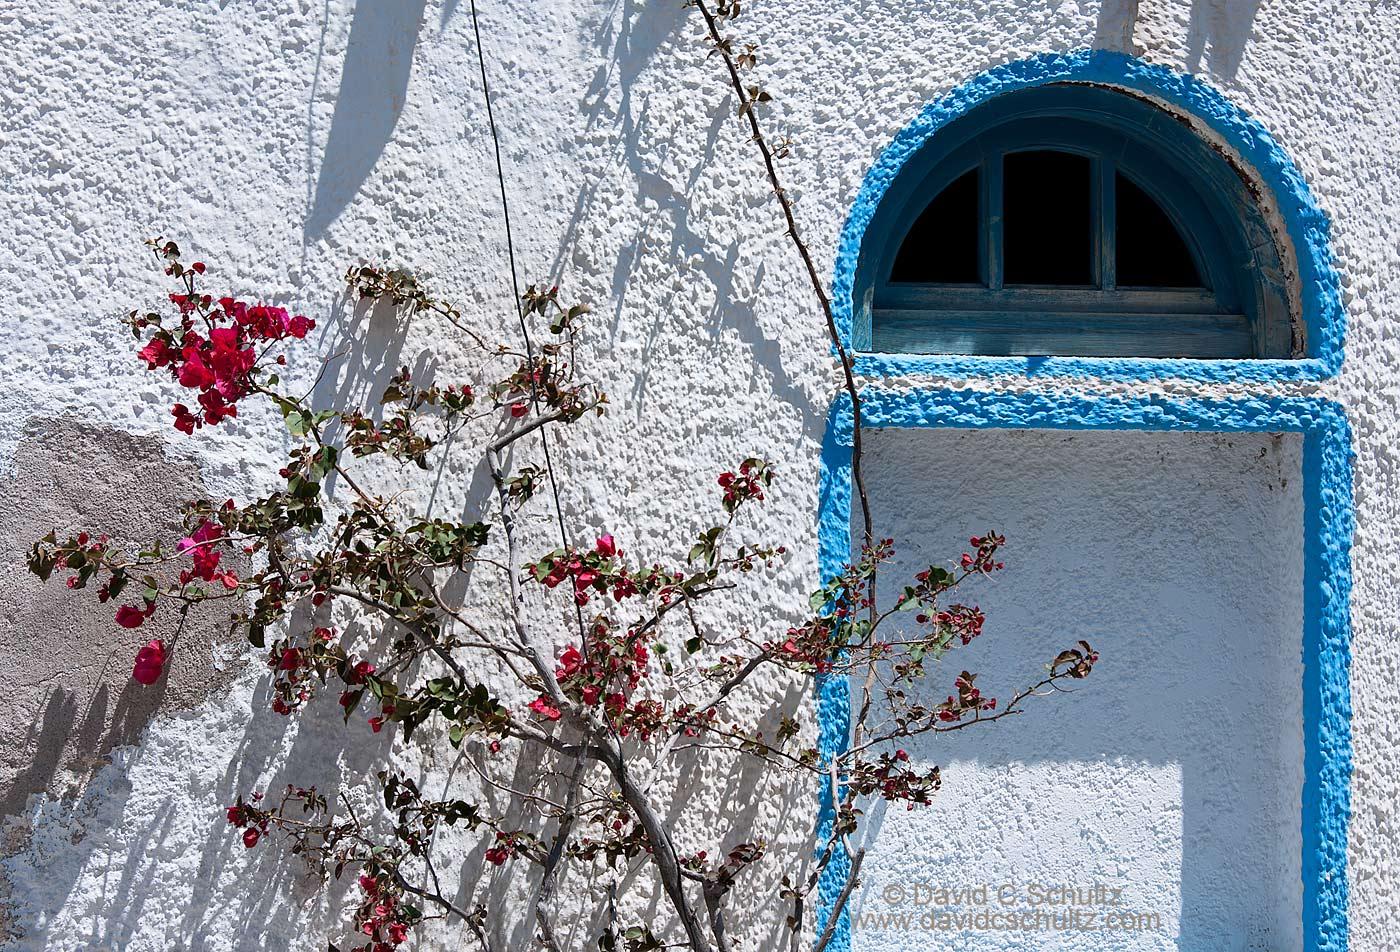 Oia, Santorini, Greece - Image #202-268